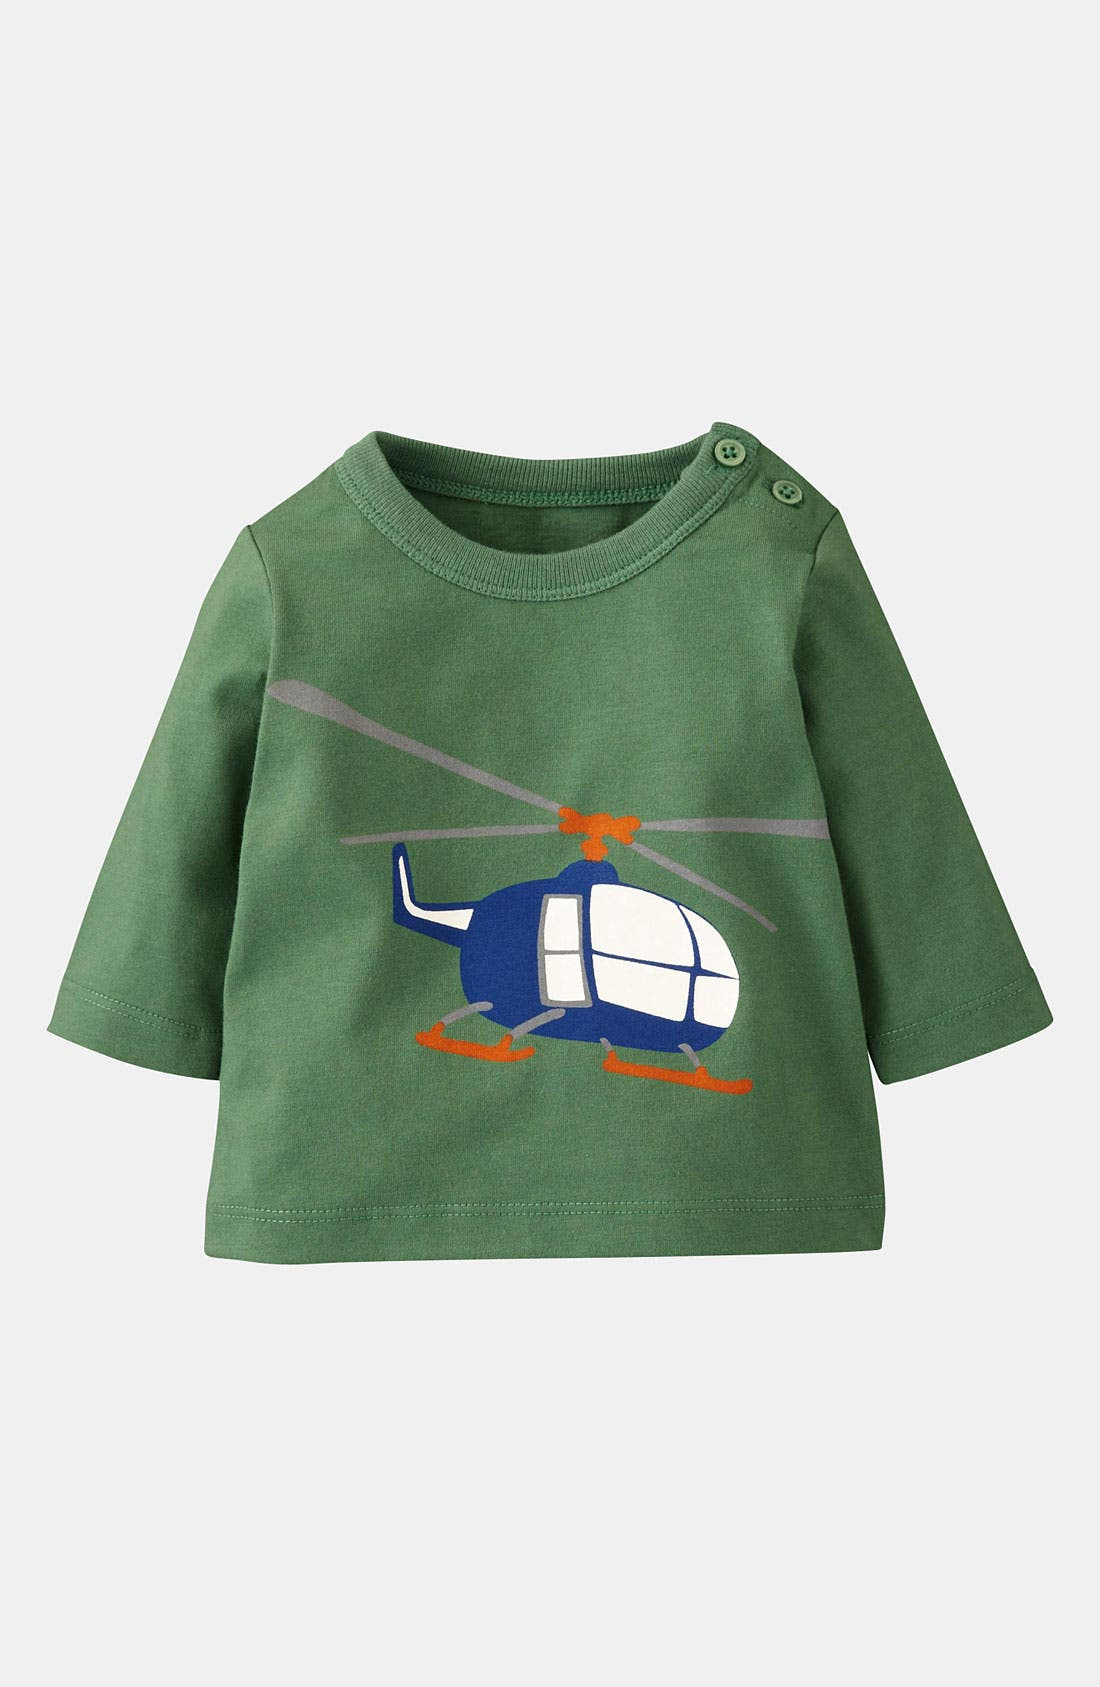 Alternate Image 1 Selected - Mini Boden 'Vehicle' T-Shirt (Infant)